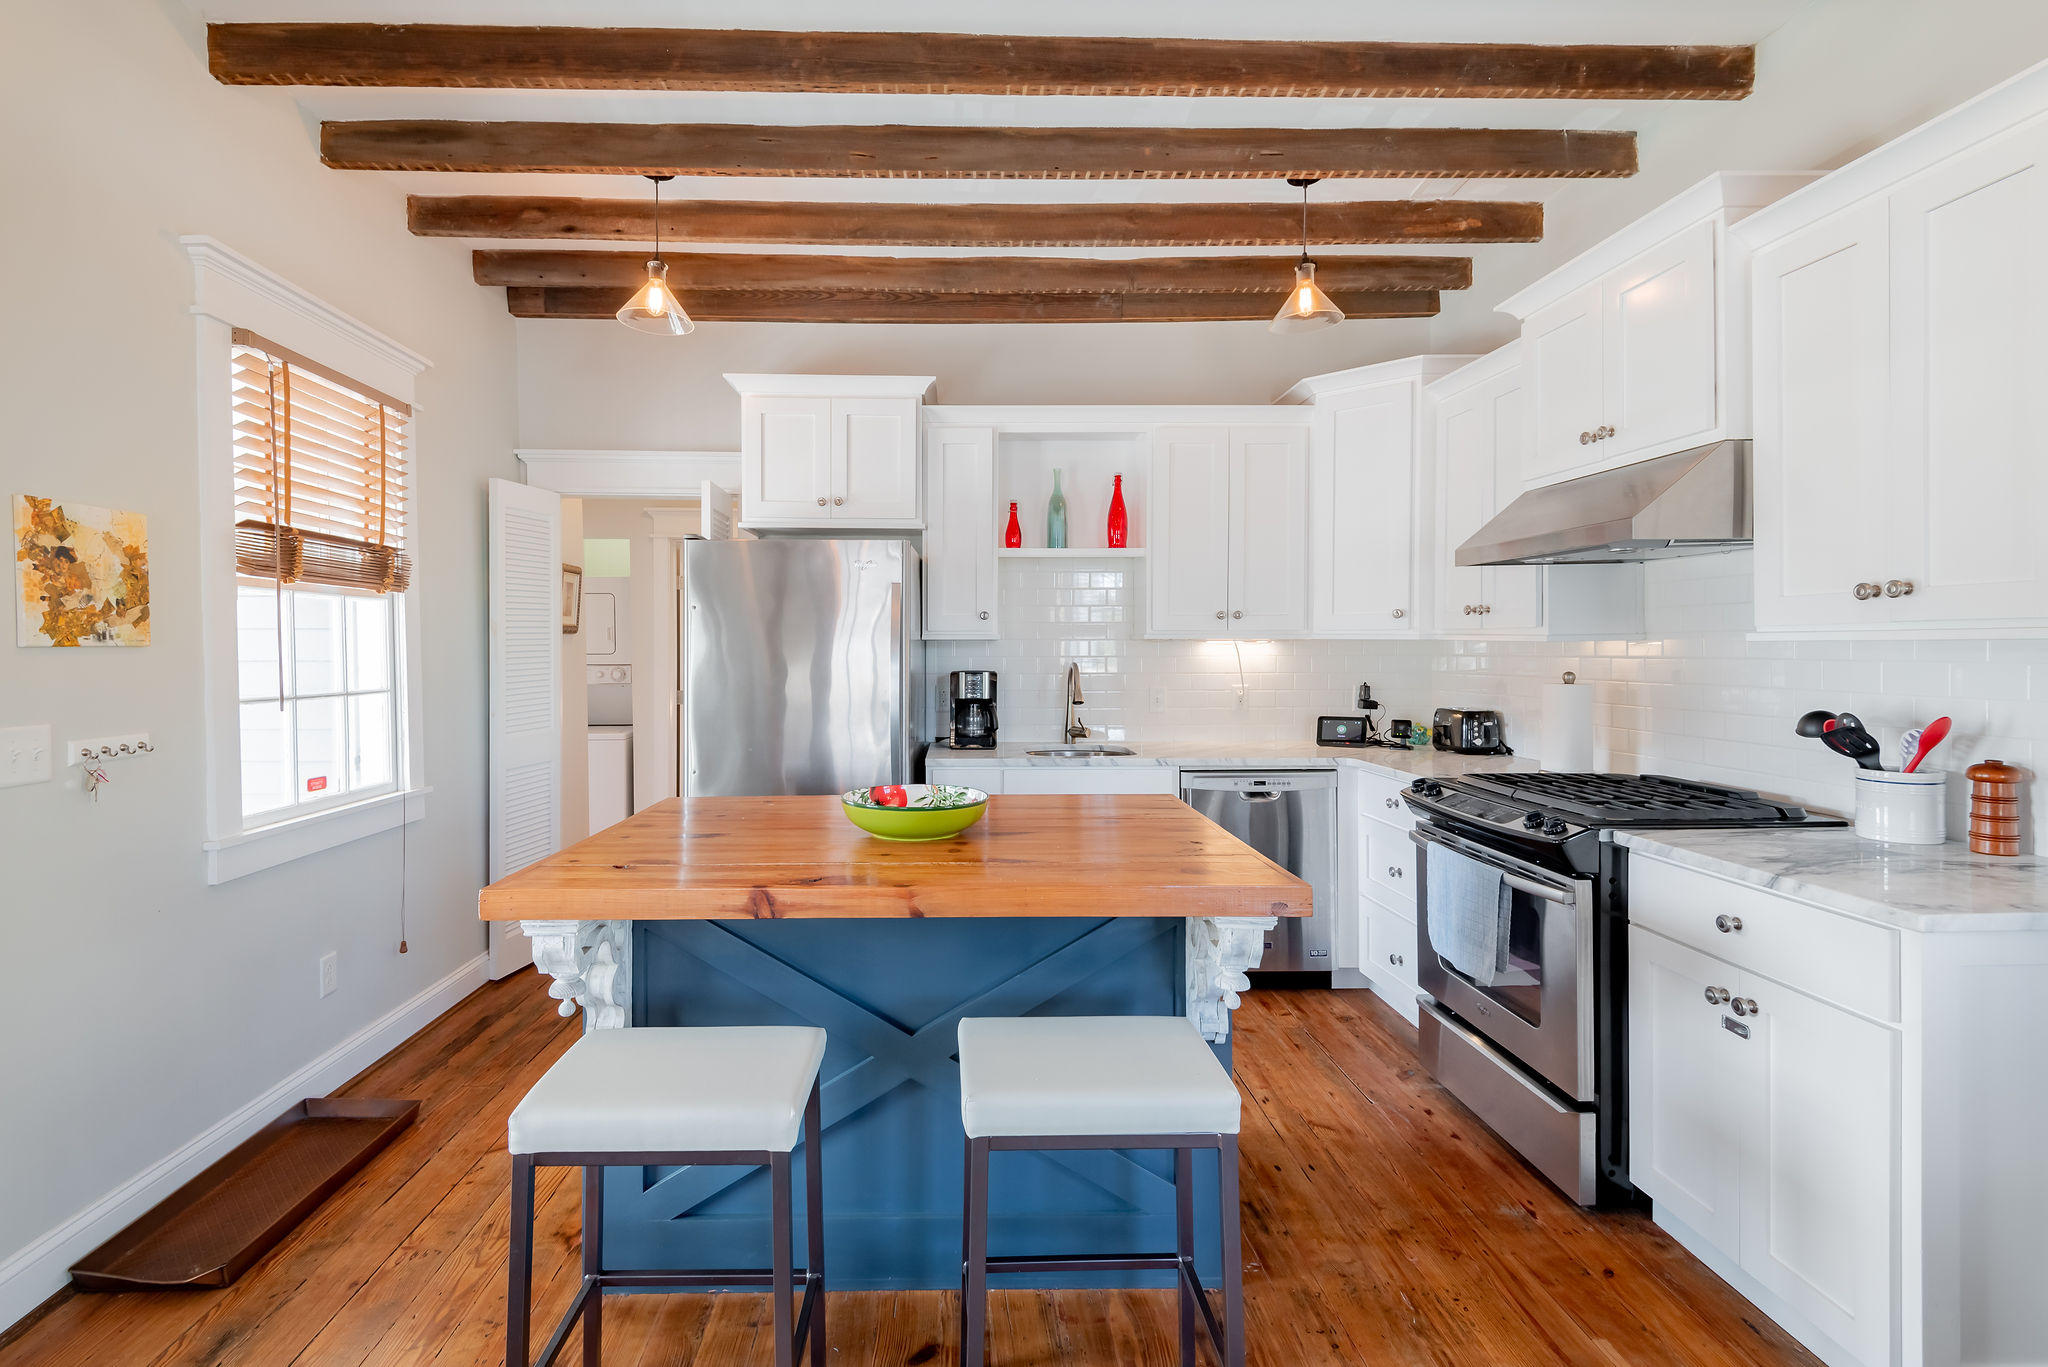 Elliotborough Homes For Sale - 29 Sires, Charleston, SC - 19